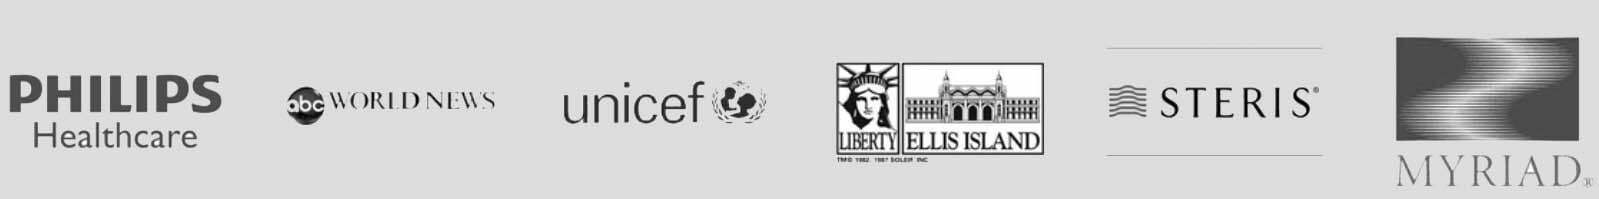 hm-pg-top-logos